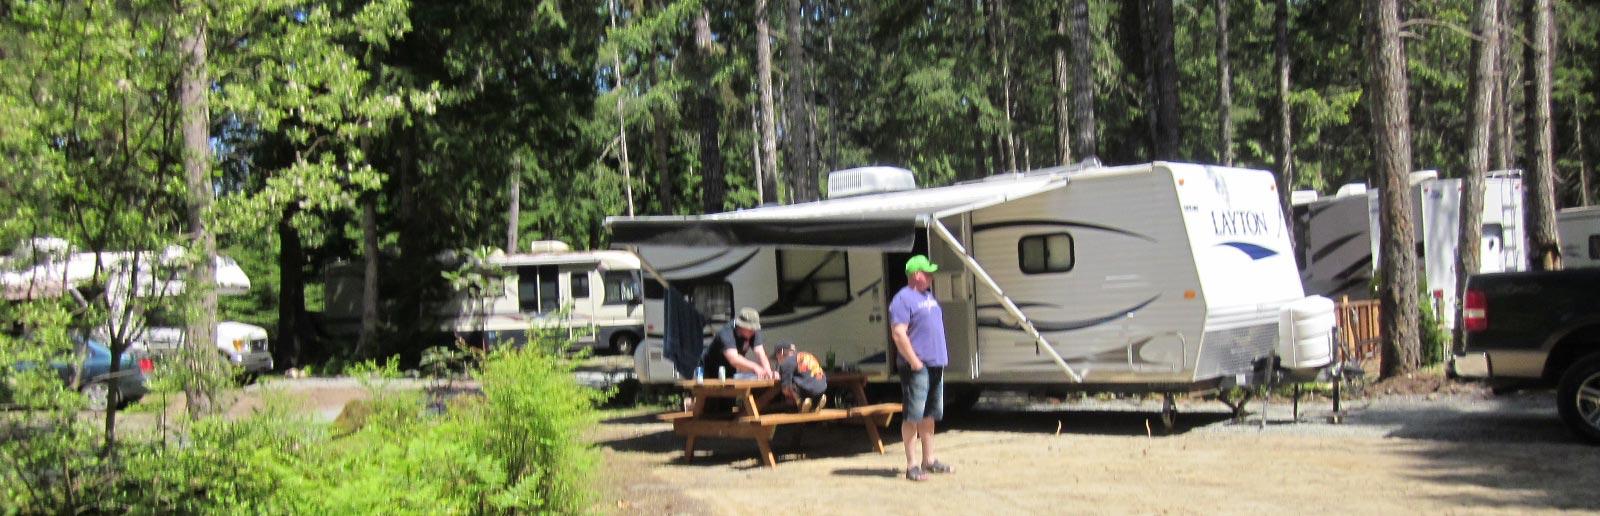 Nanaimo RV Campground